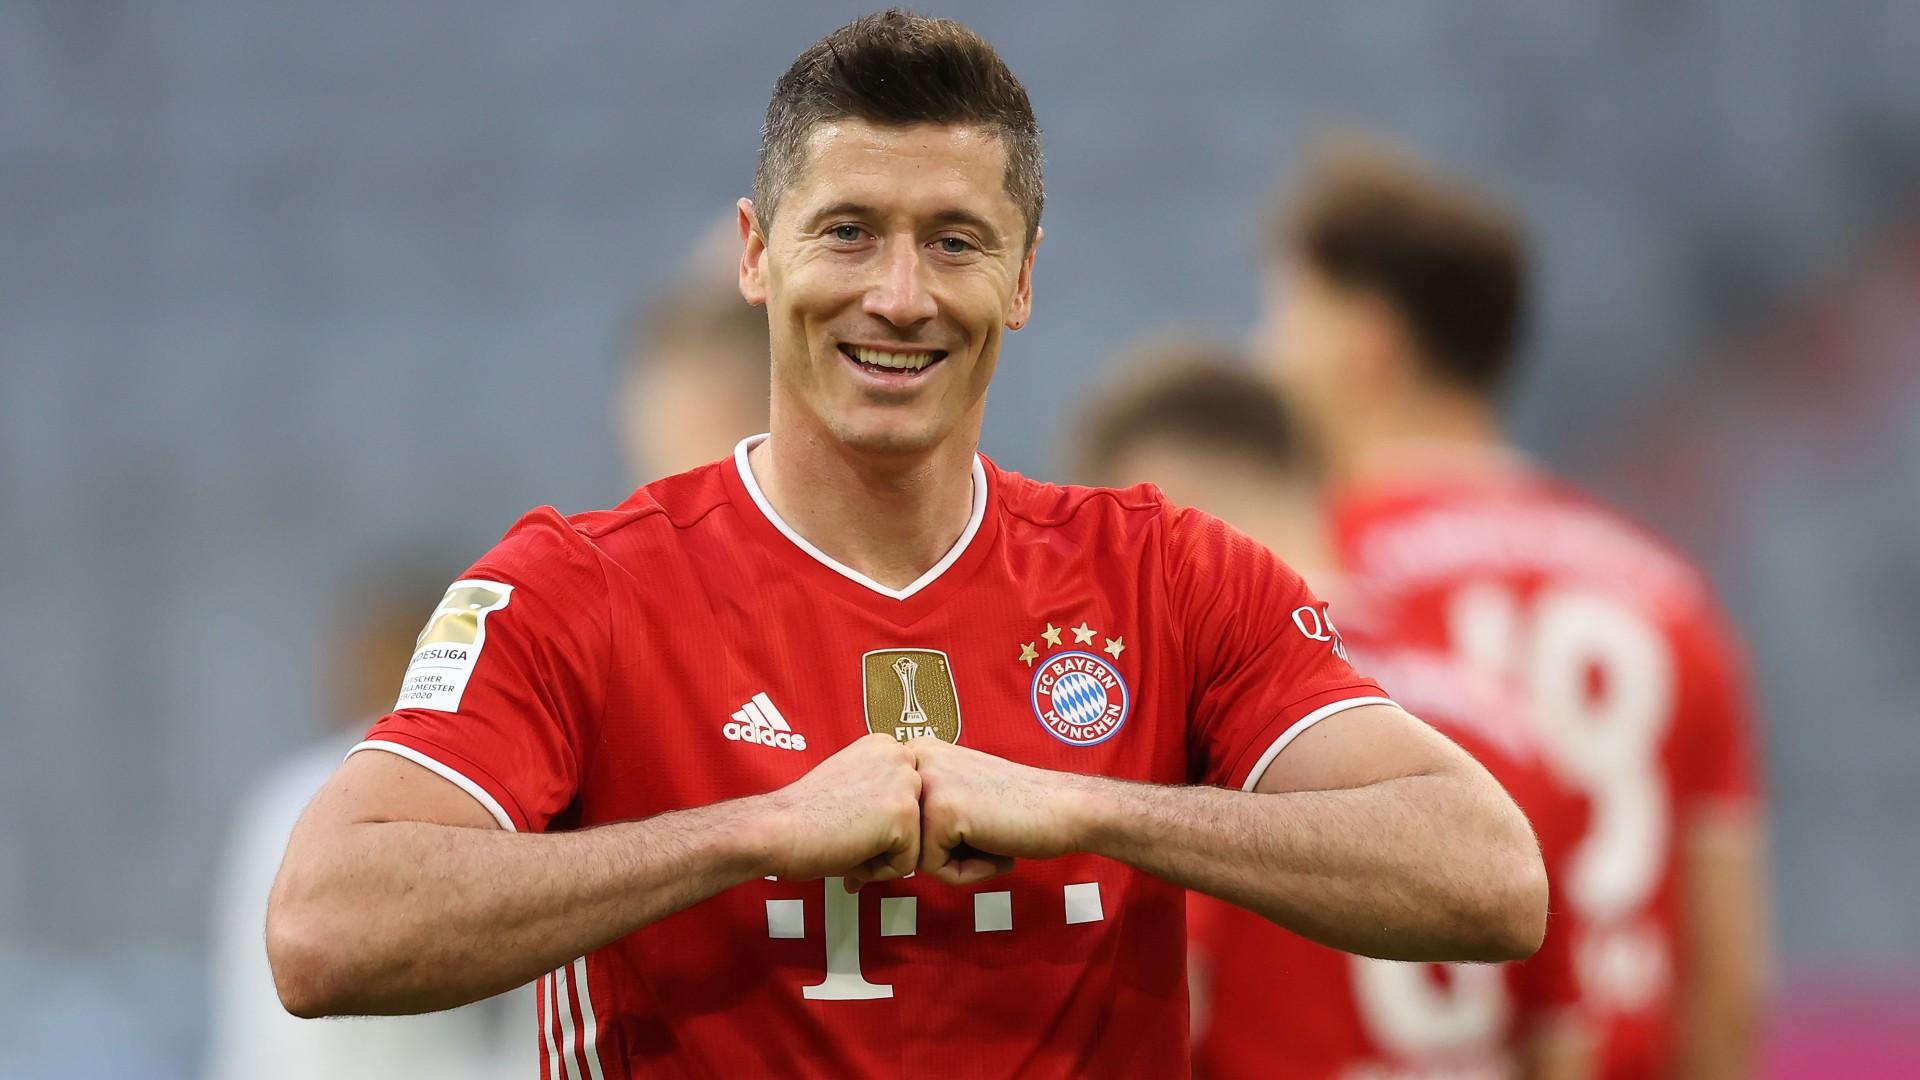 Lewandowski wins Germany's Footballer of the Year for second successive season ahead of Muller & Haaland